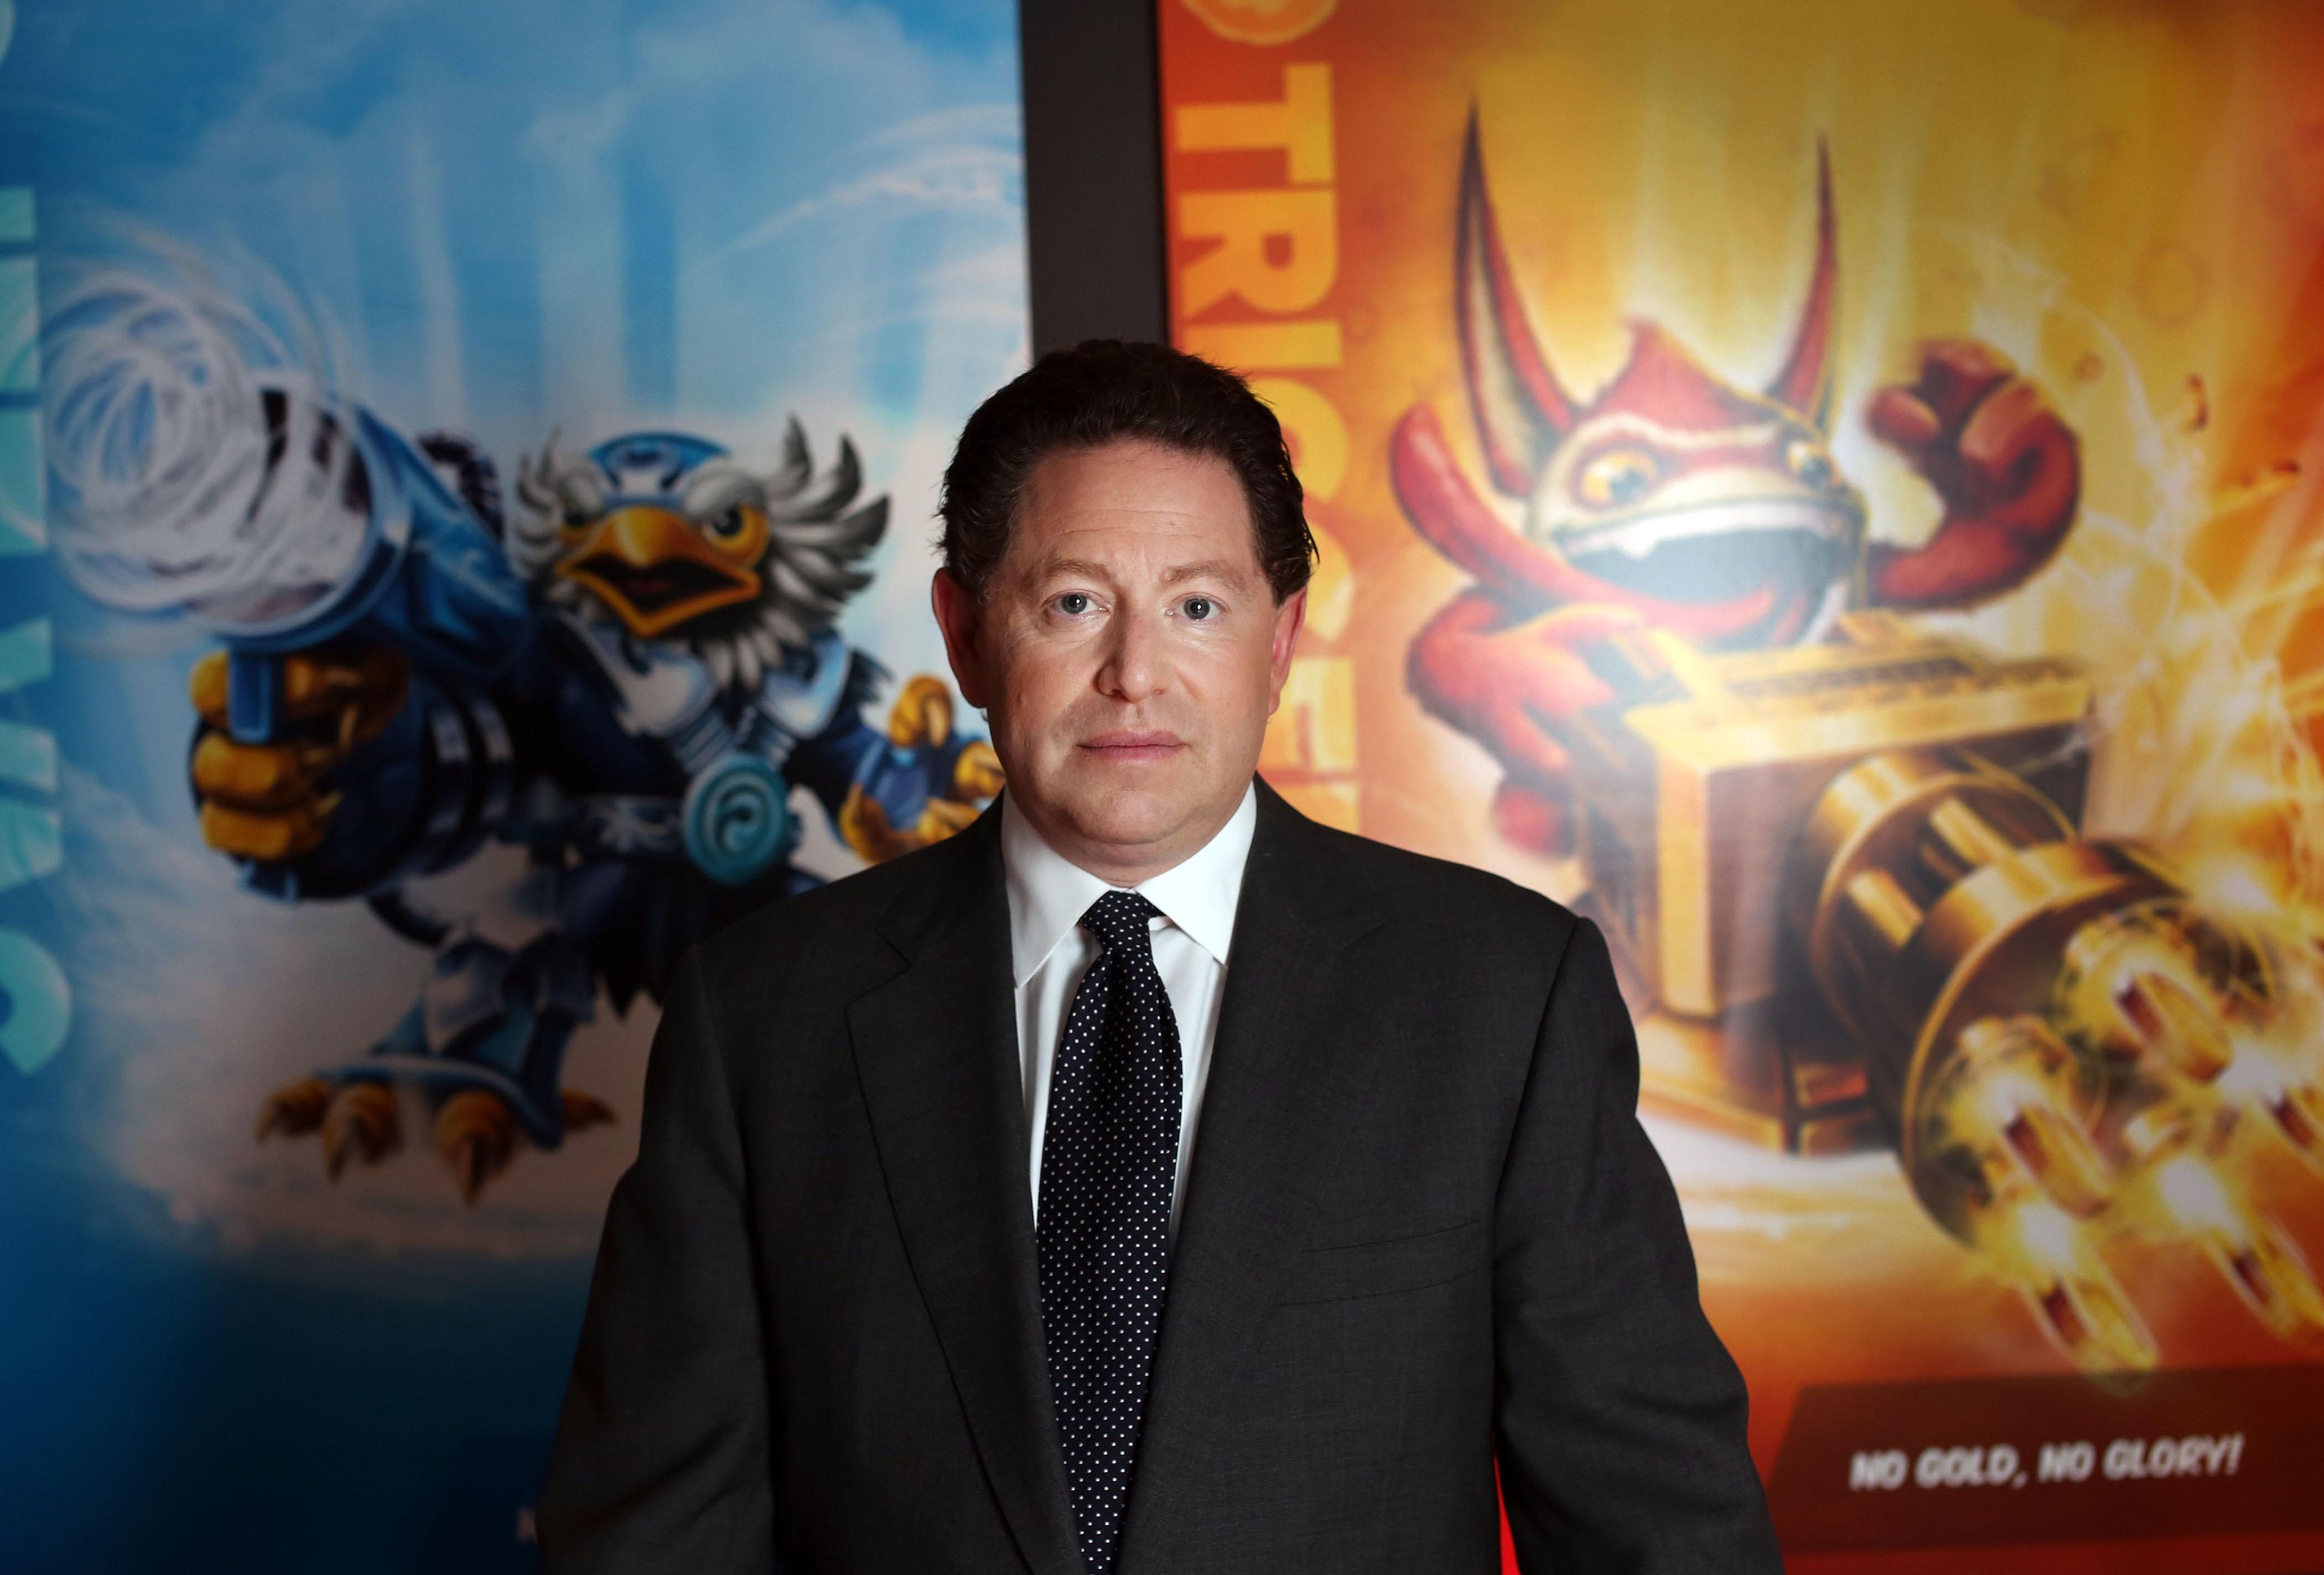 Activision Blizzard CEO Robert Kotick